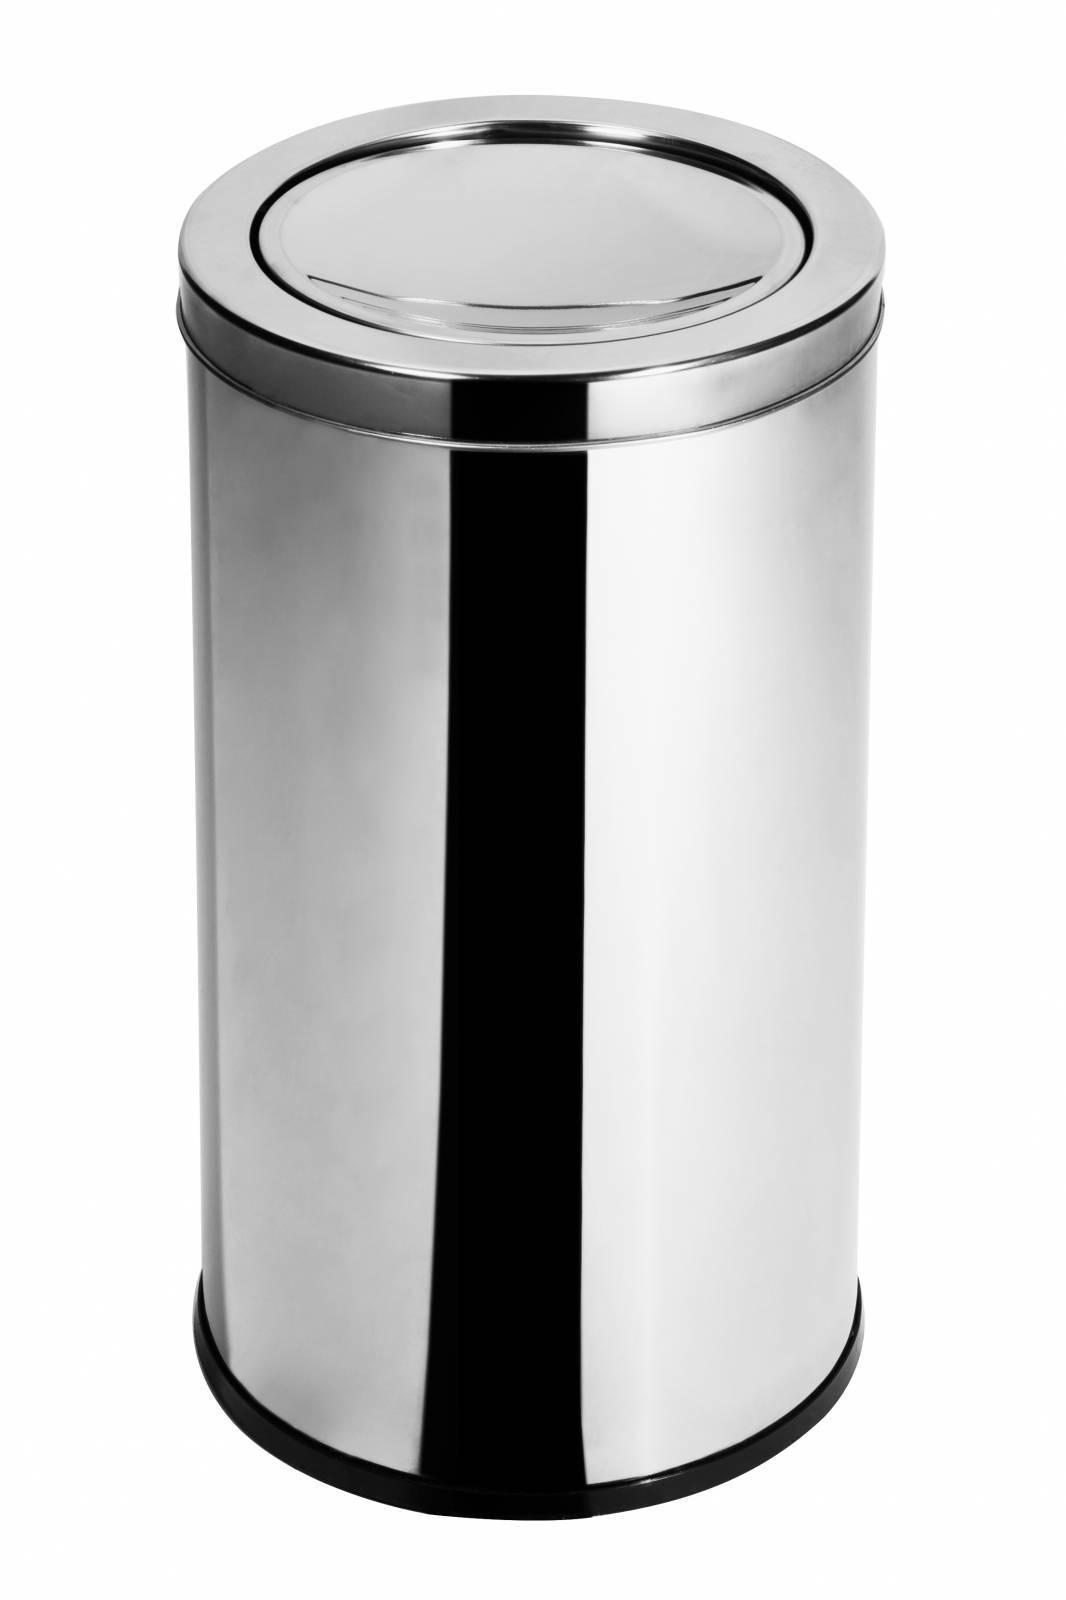 Lixeira Inox c/ tampa Basculante 14 - Litros Elegance